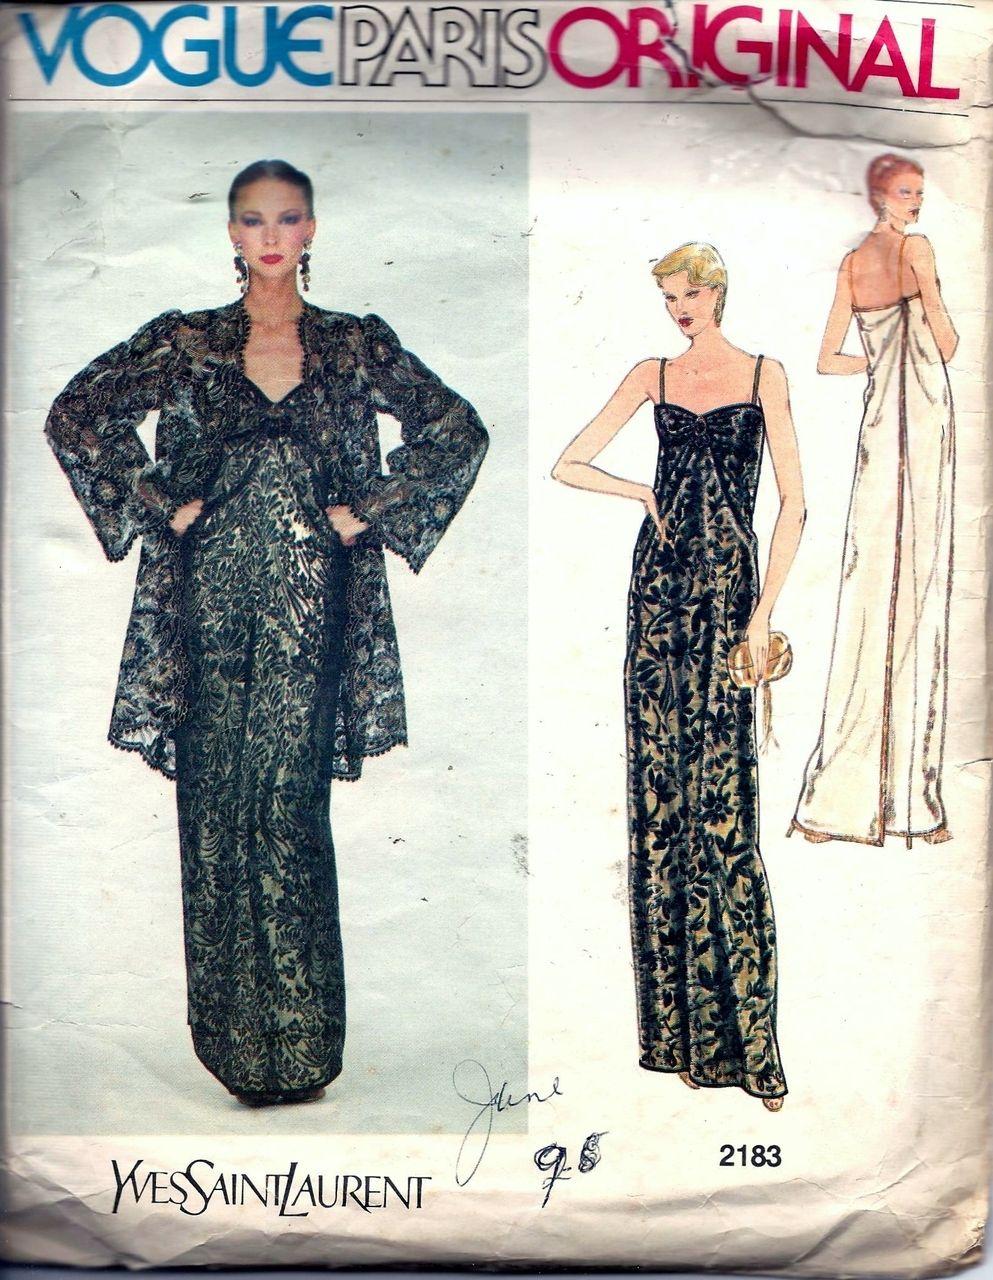 Vintage Pattern Emporium - Vintage 70s Vogue Paris Original Yves ...